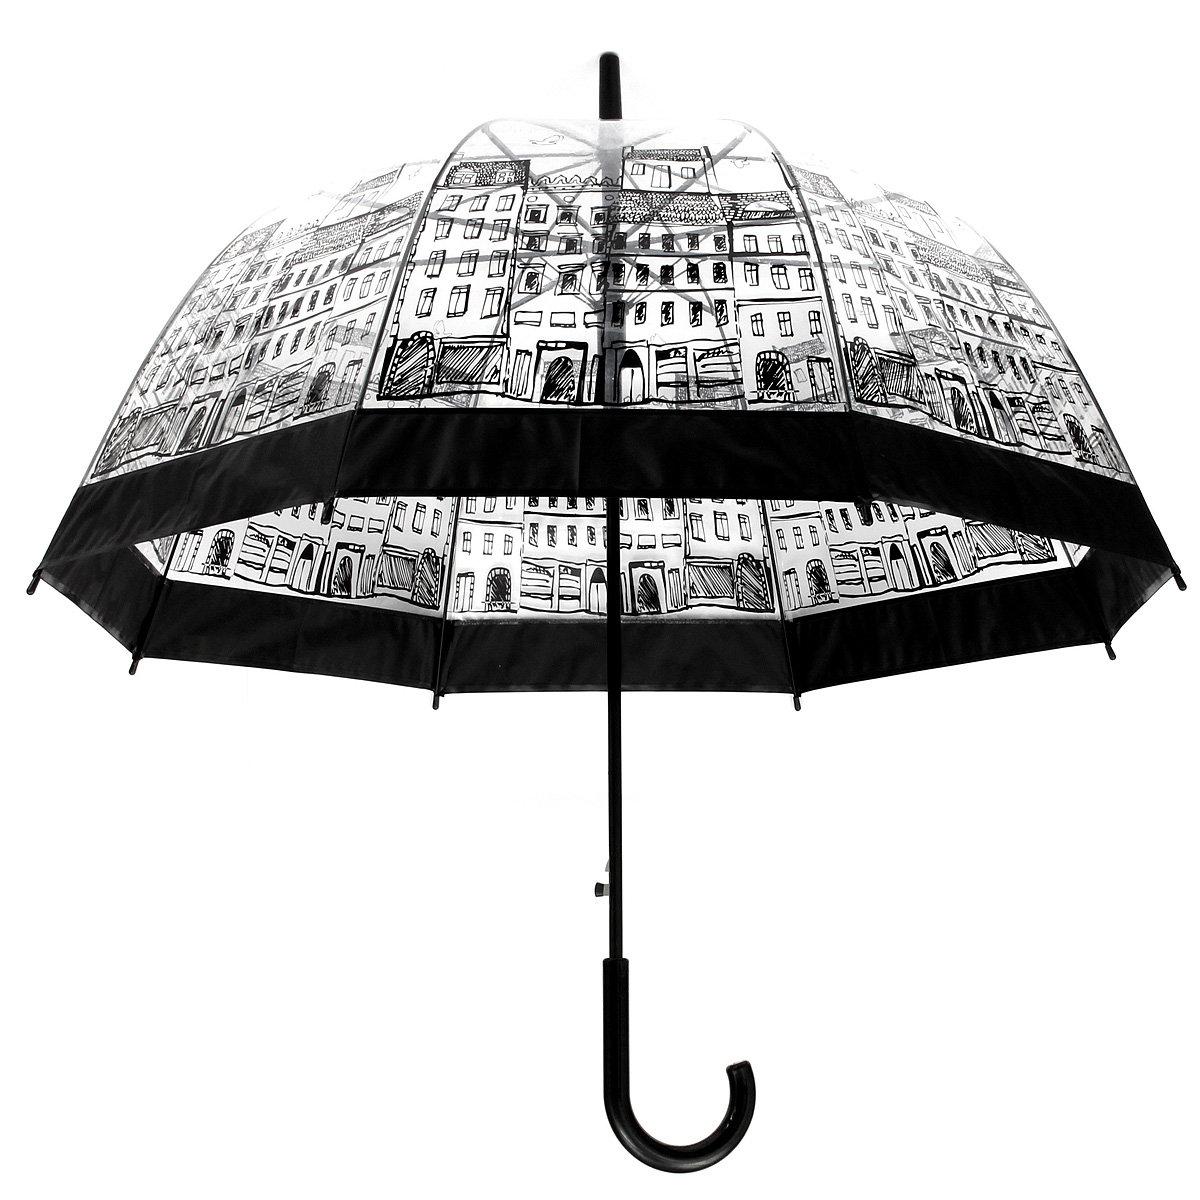 Lady Transparent Lace Umbrella Girl Beard Outdoor House Creative Elegant Rain Gear